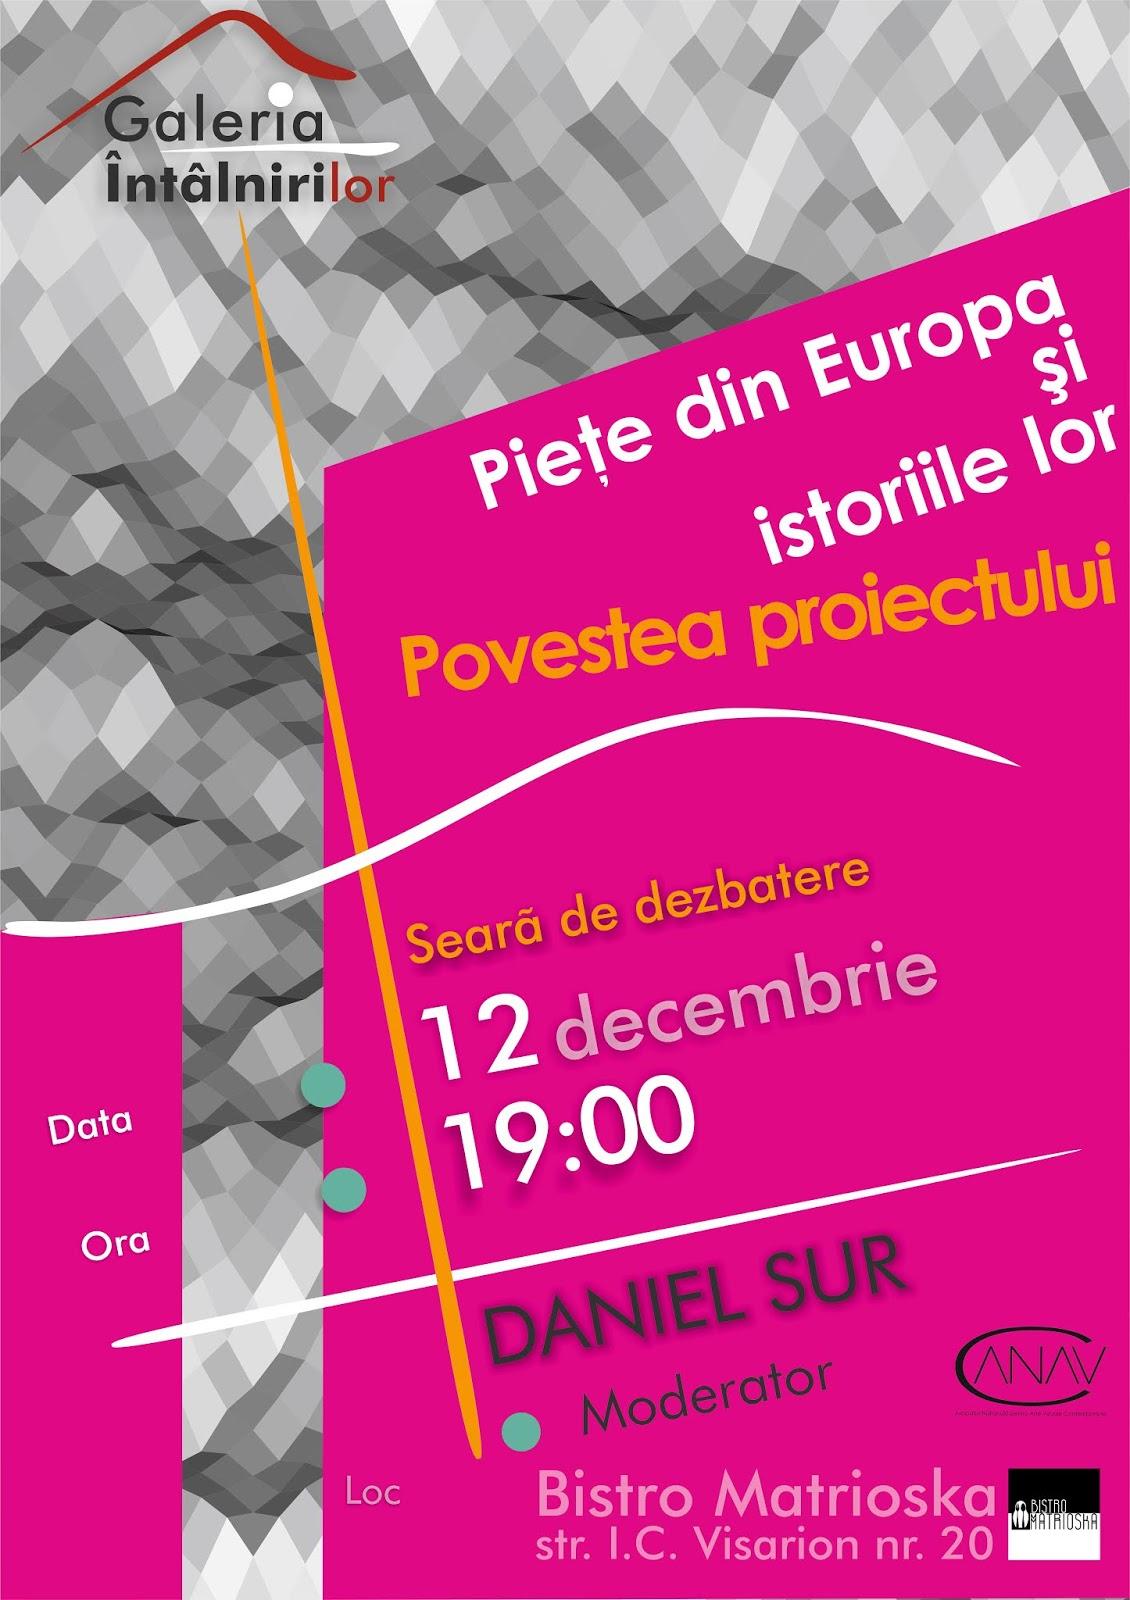 POSTER-Galeria-Intalnirilor-12-decembrie